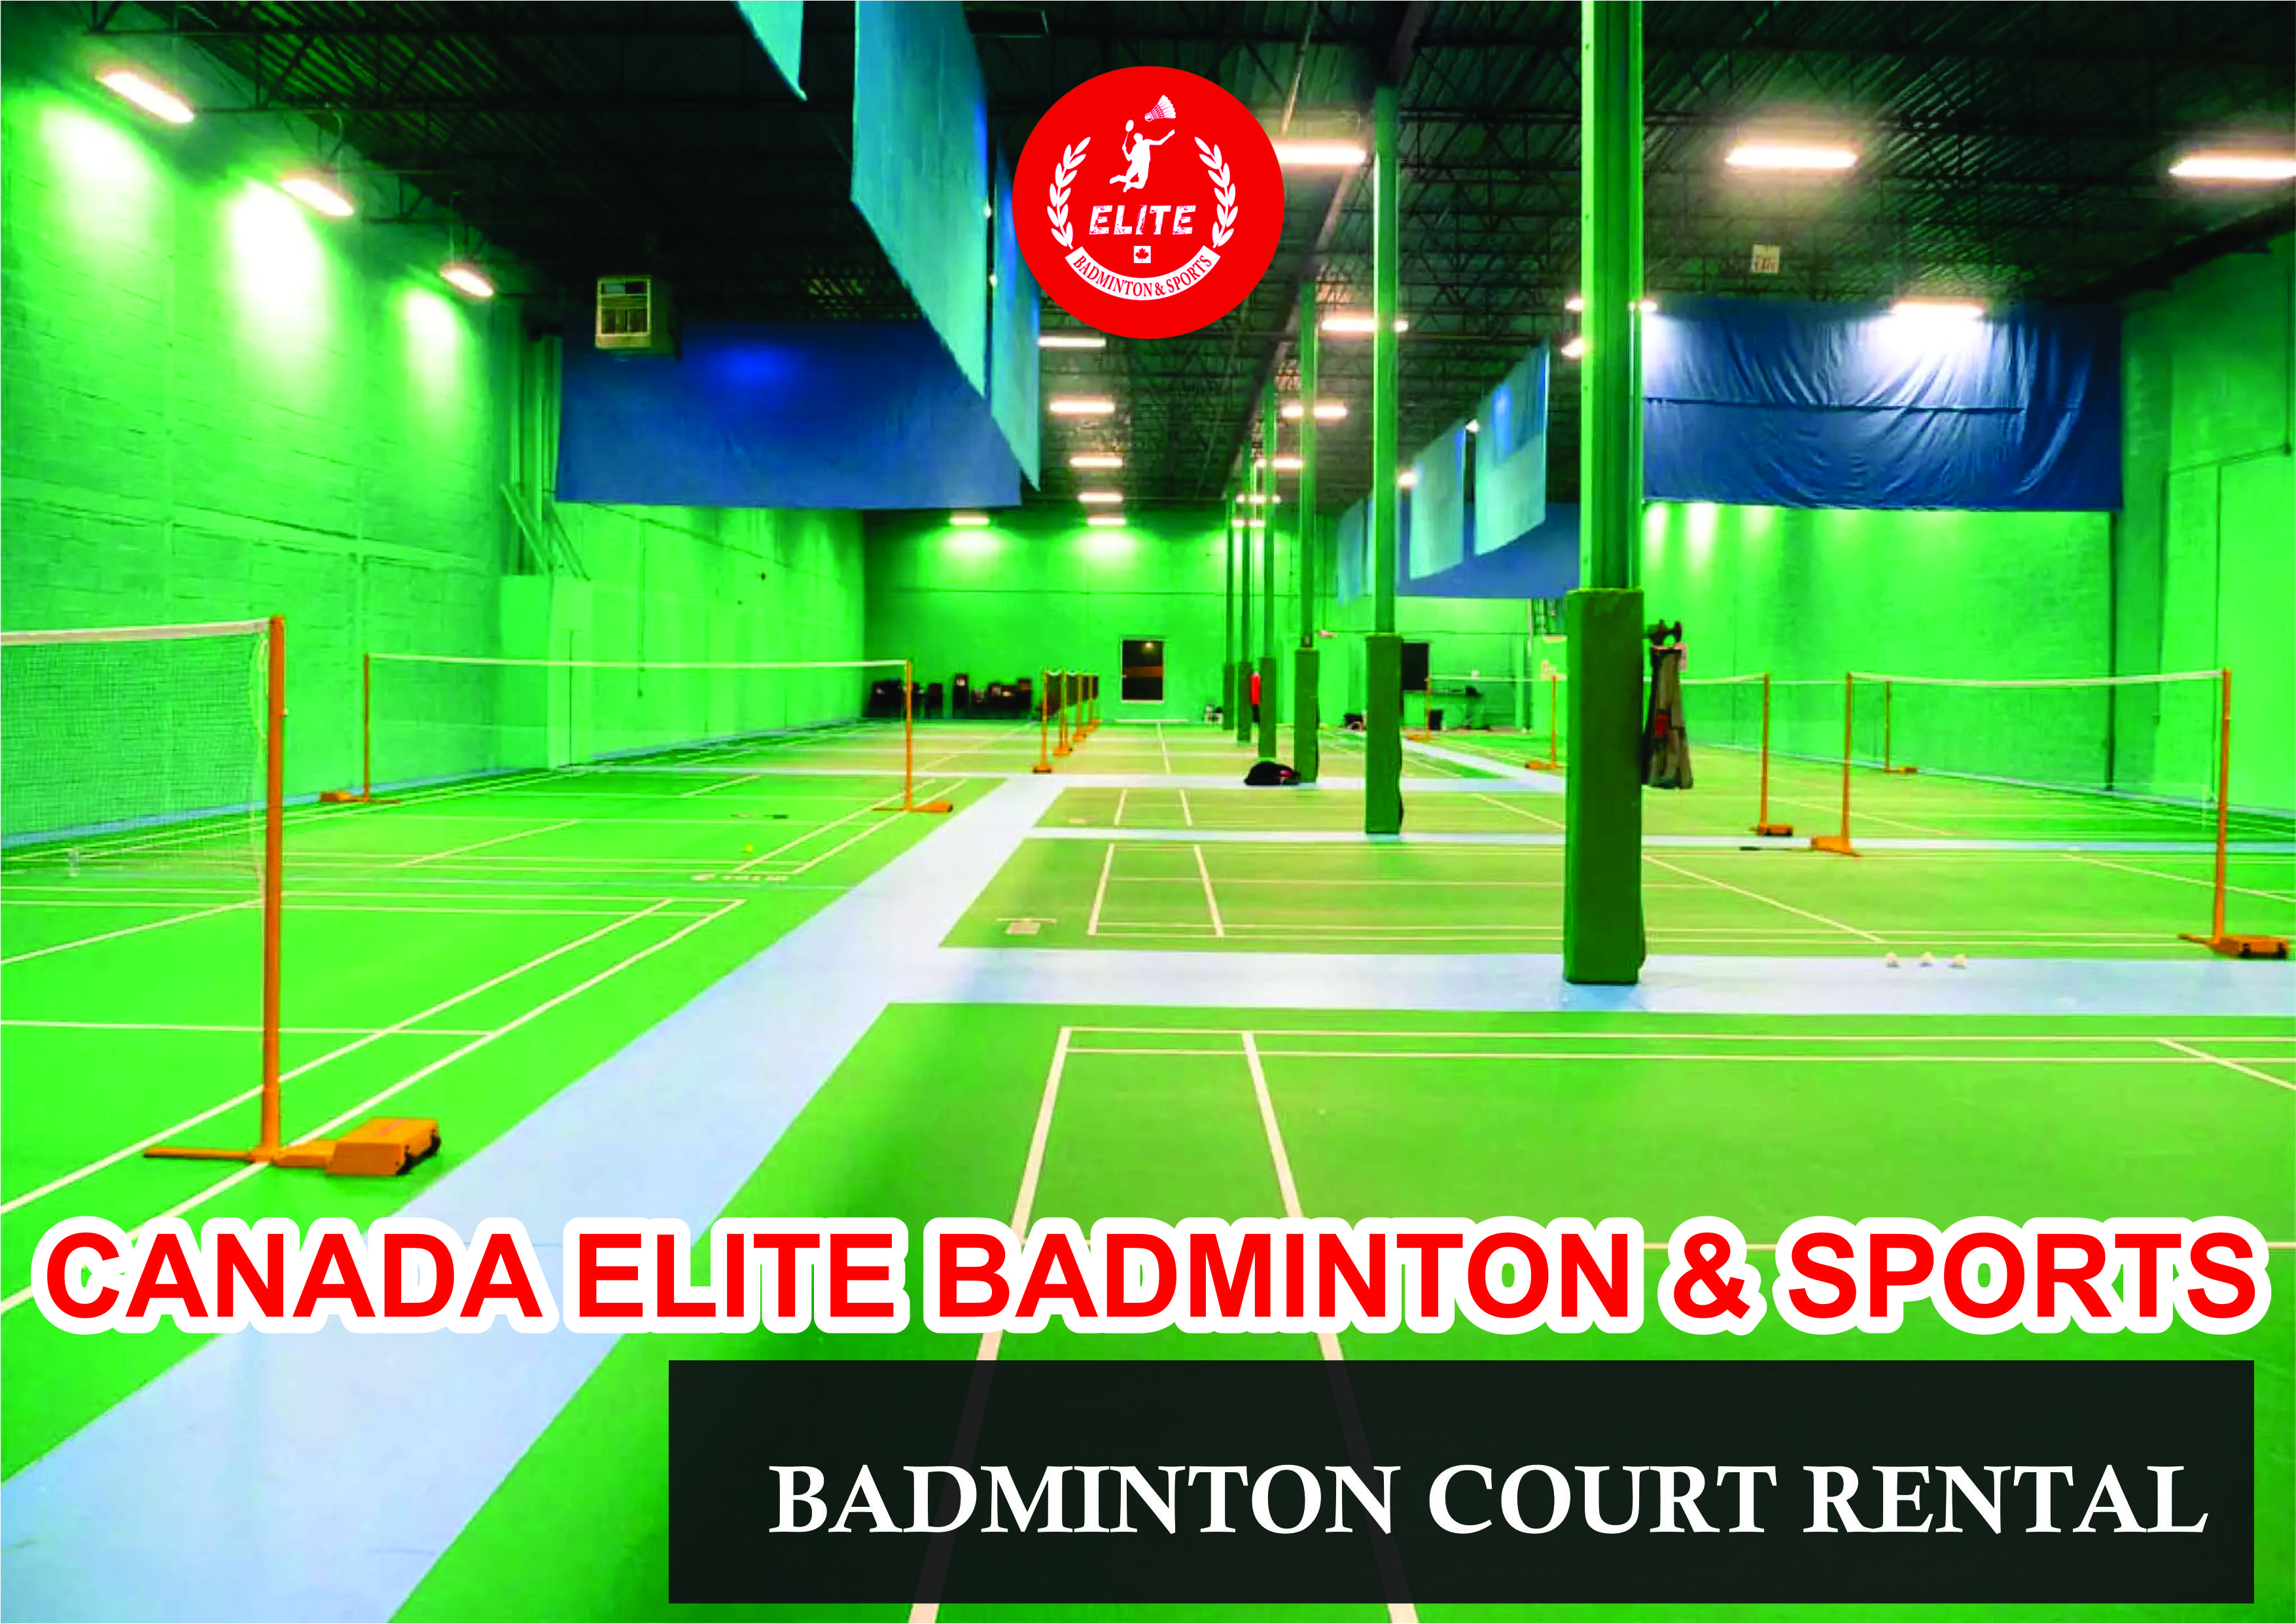 Serve Smash Win And Enjoy Badminton At Canada Elite Badminton Sports Issuewire